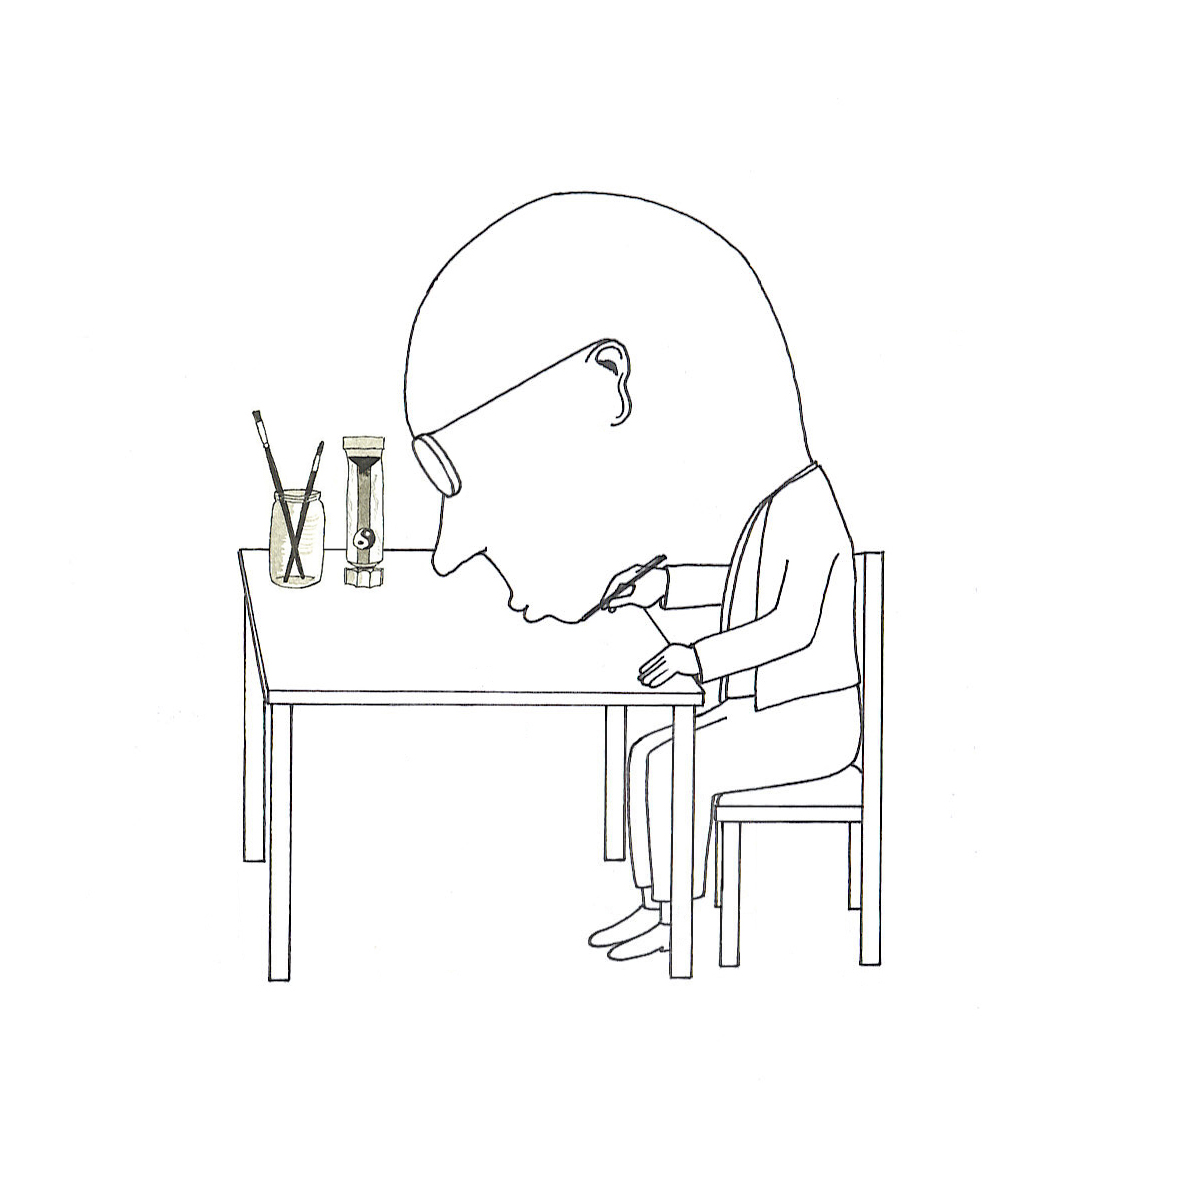 tekenaar3